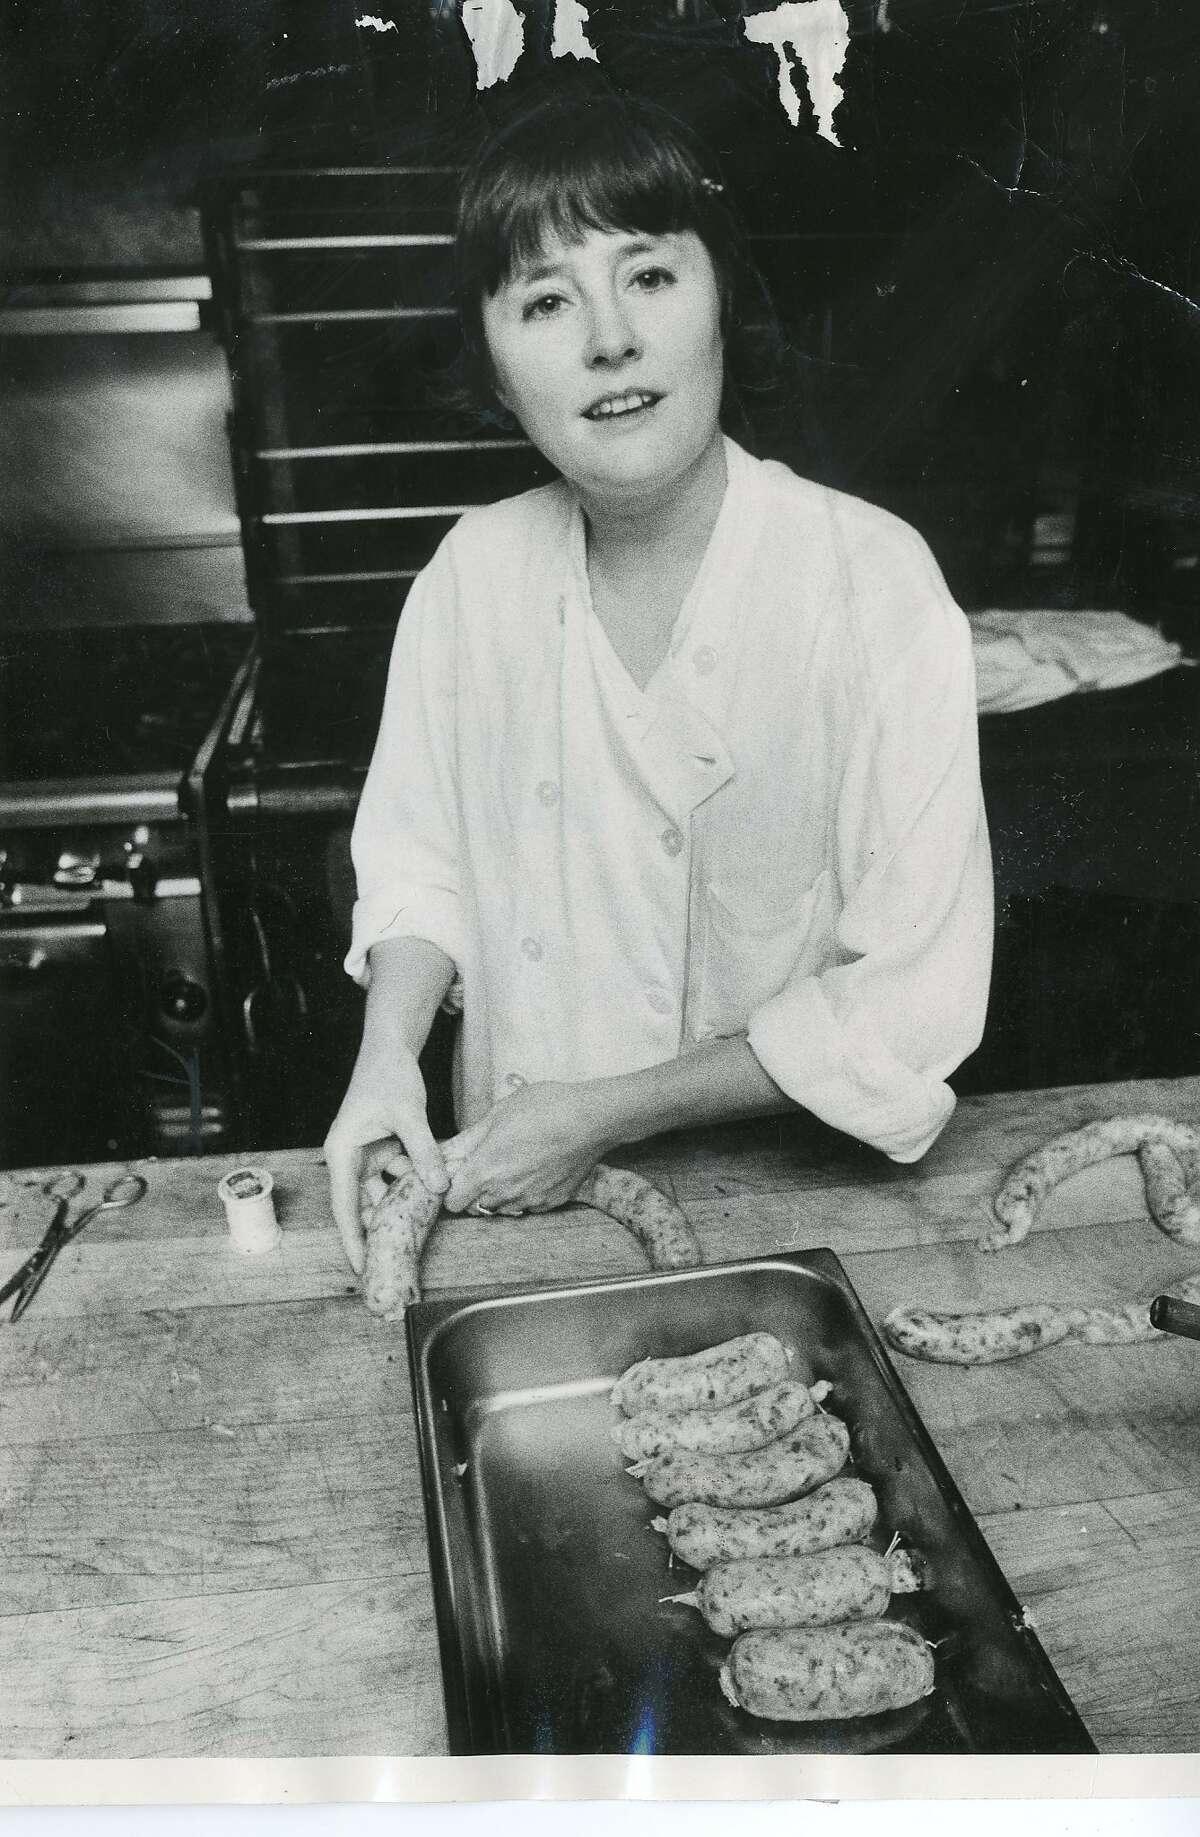 Alice Waters on Dec. 20, 1981 at Chez Panisse in Berkeley, Calif.